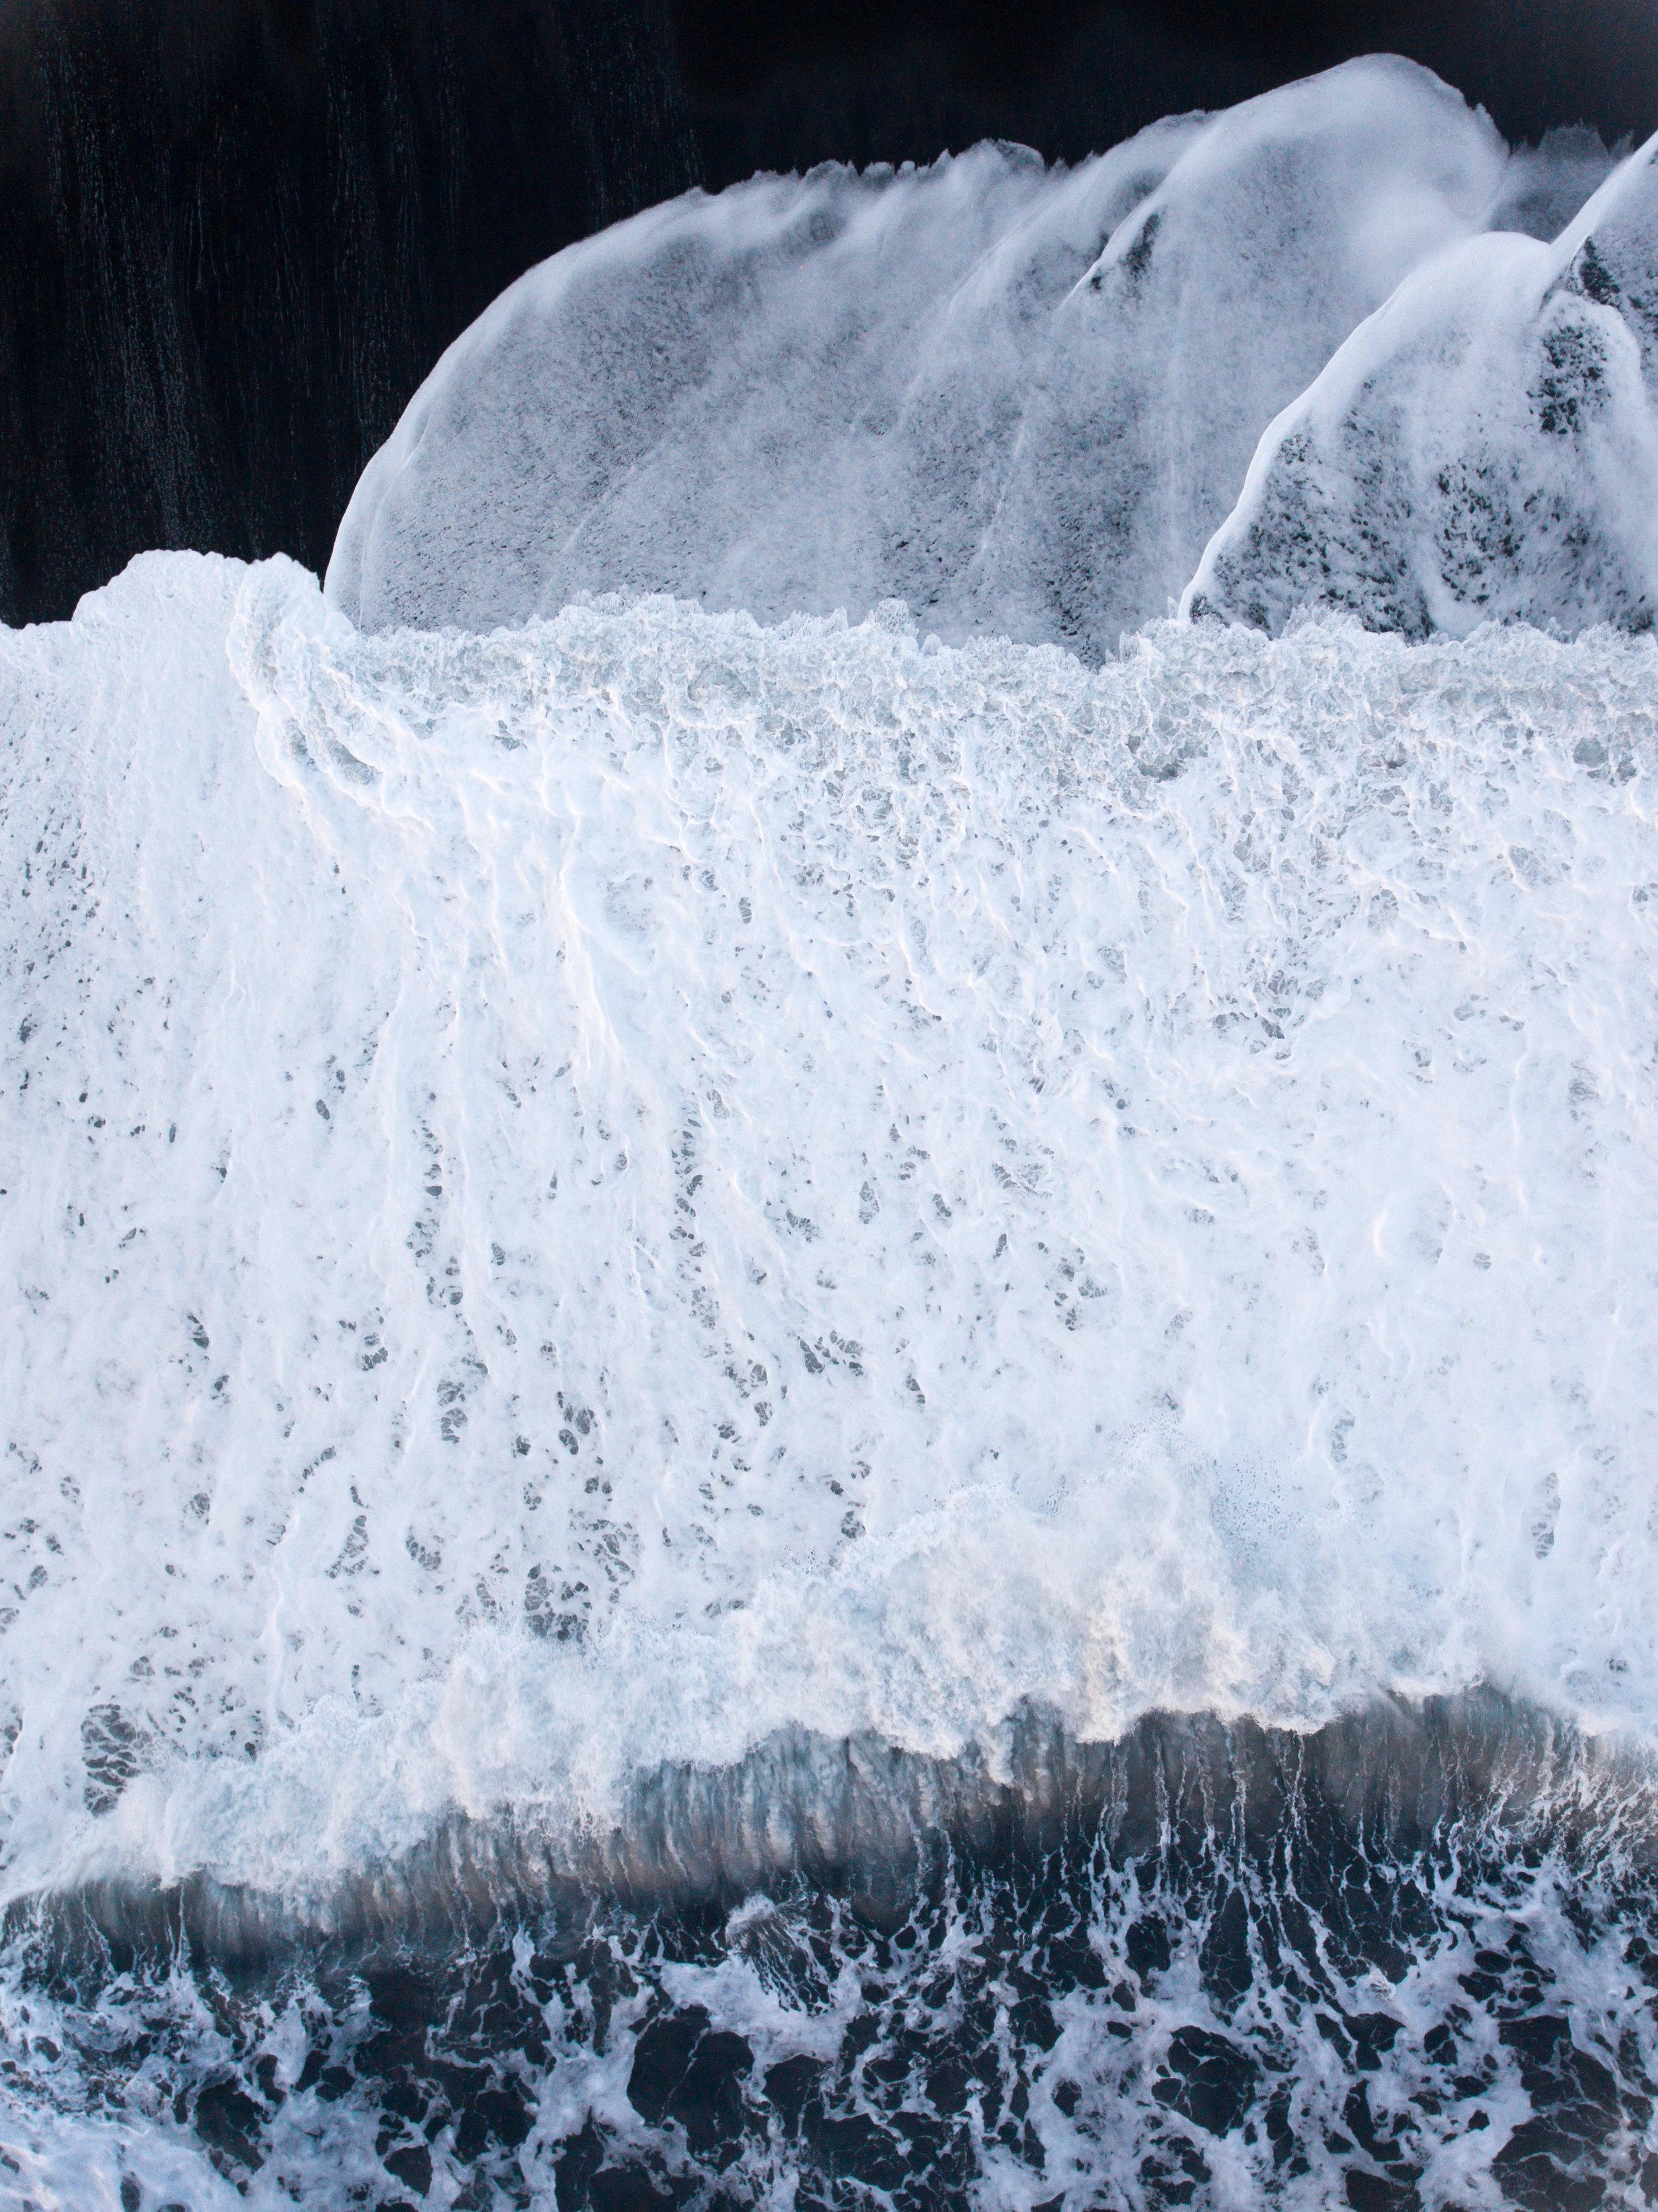 jermiah-schuster-iceland-394.jpg